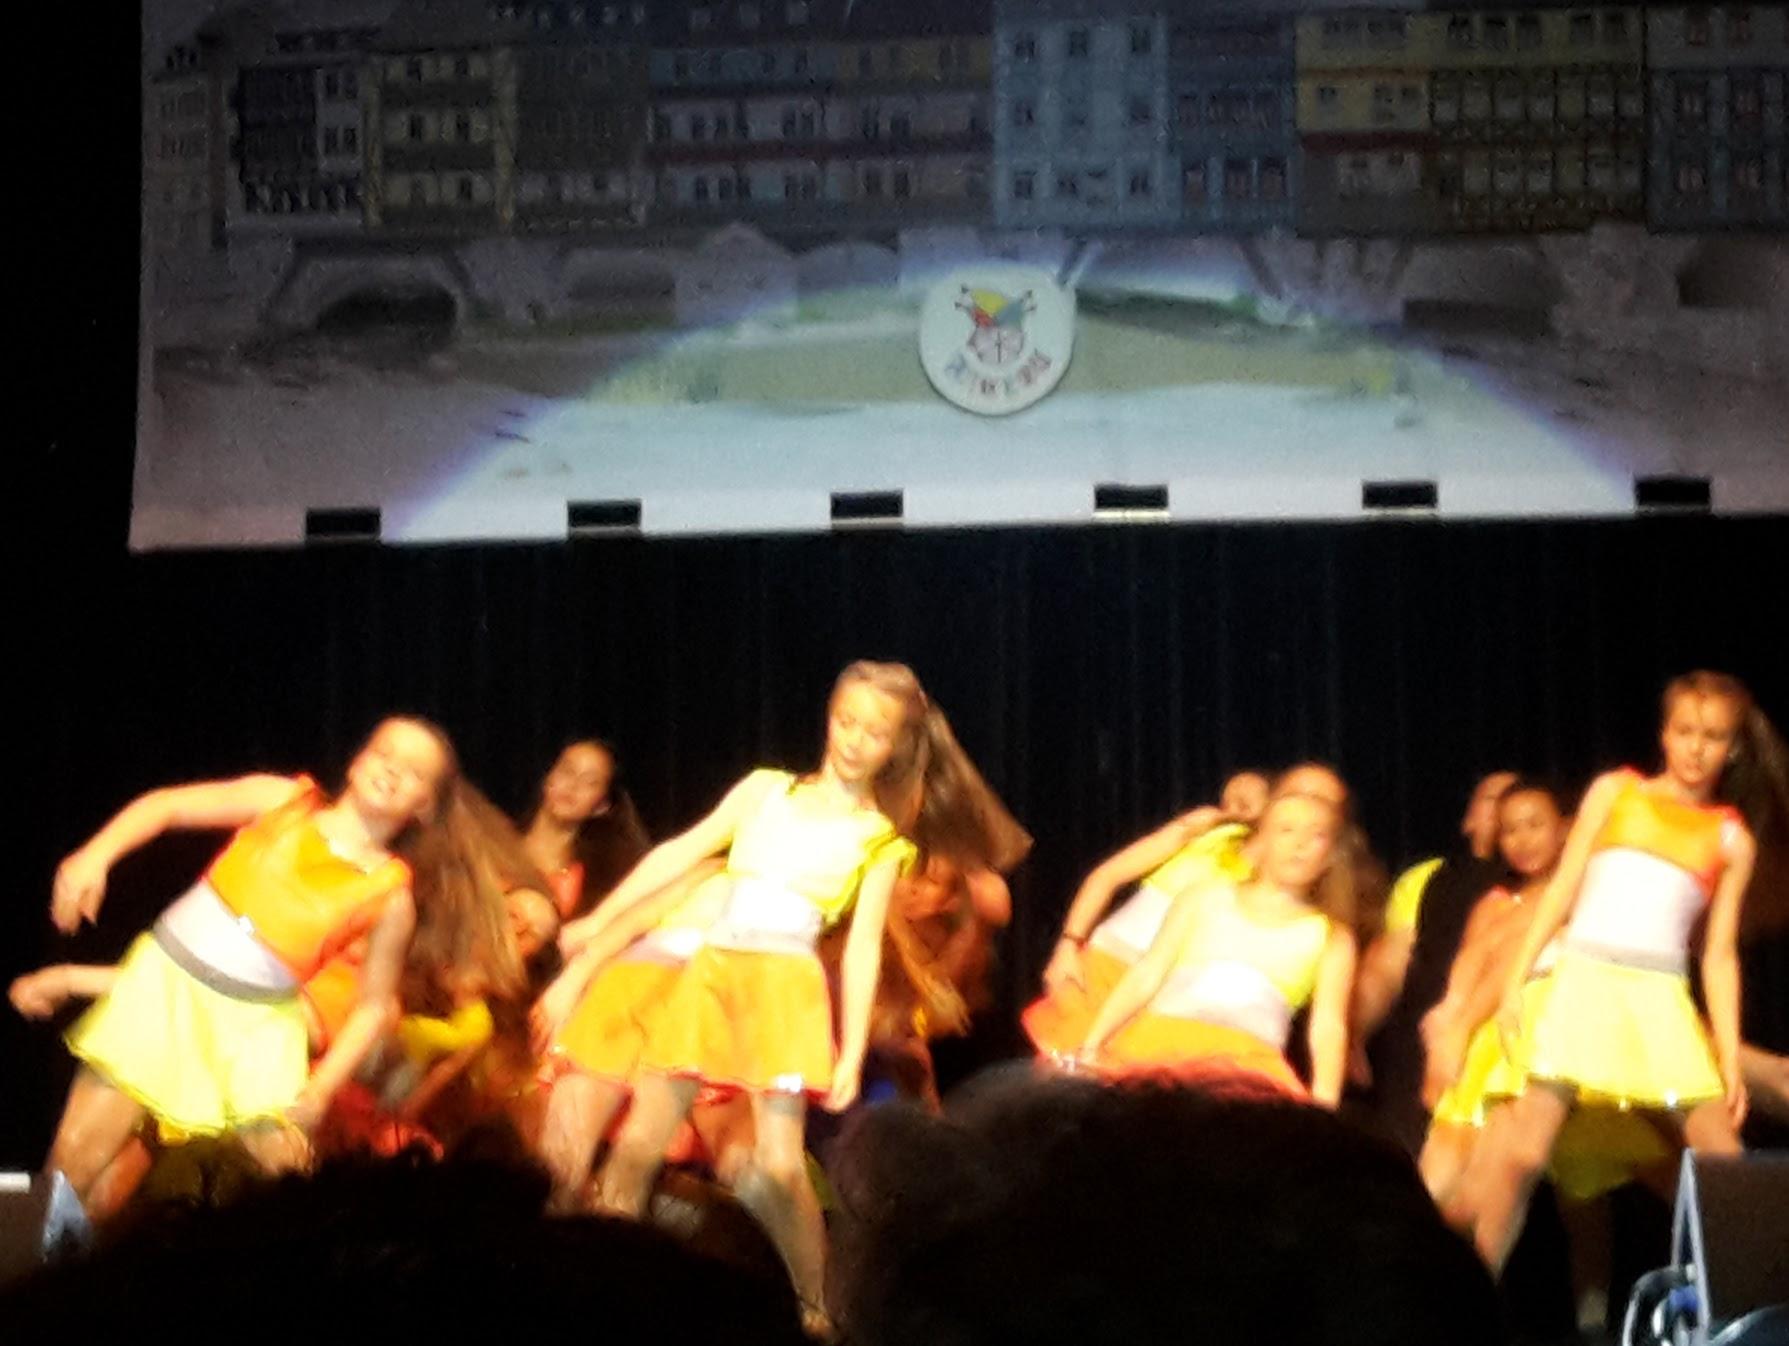 2017.11.18 FaCeDu SessionsEröffnung 18 Crazy Dancers